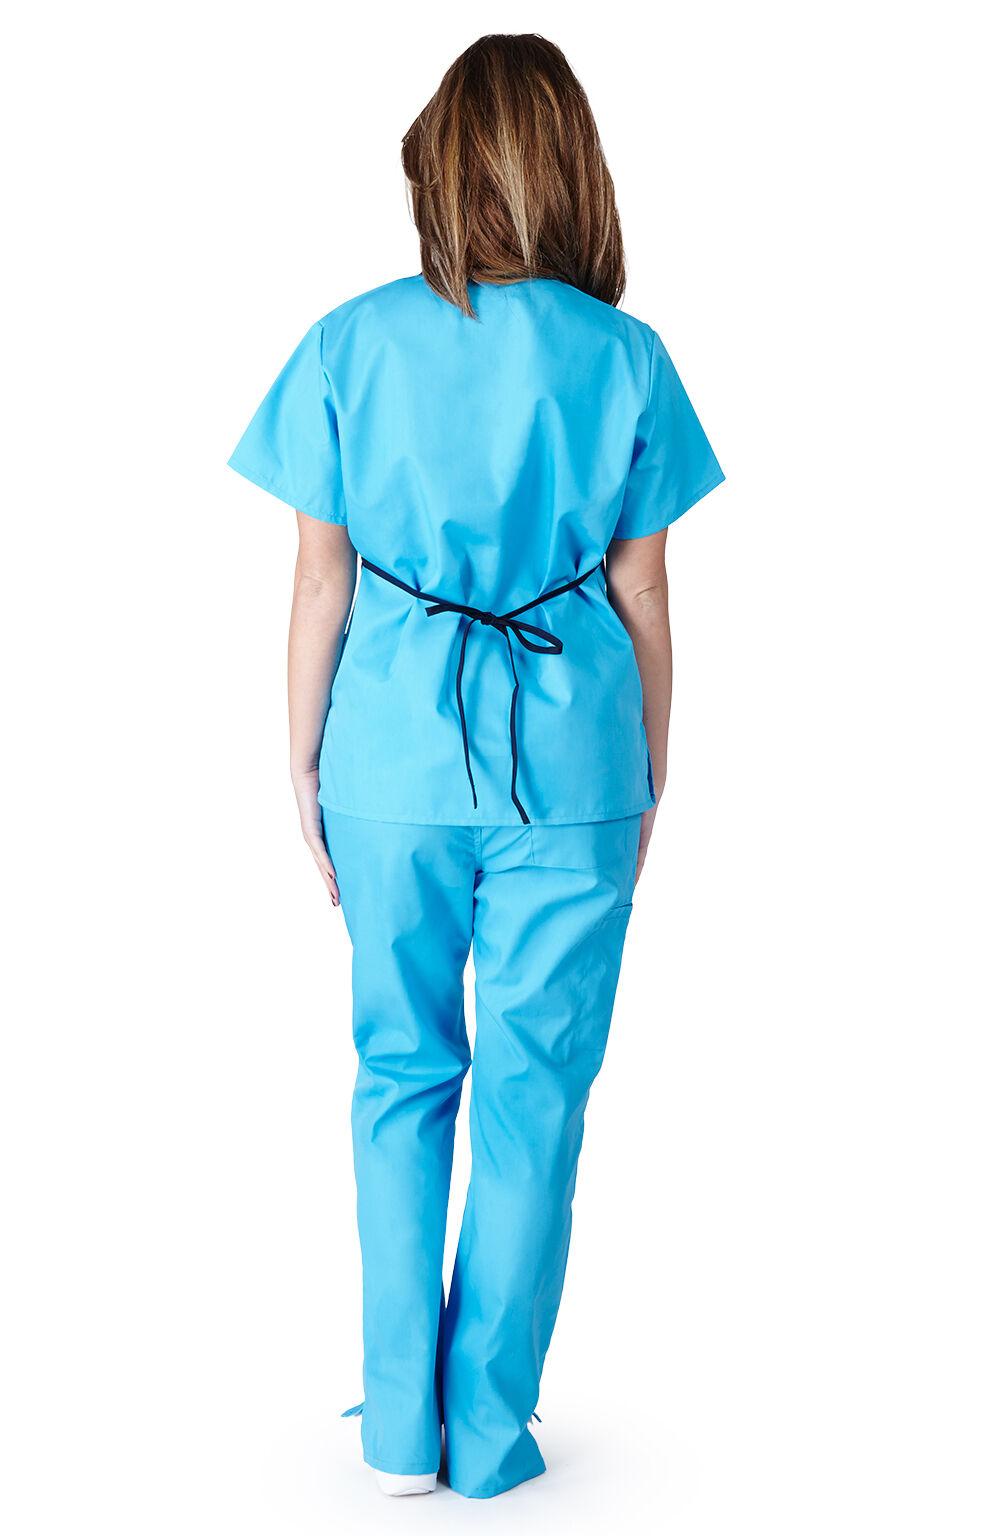 Medical Nurse Scrubs NATURAL UNIFORMS Contrast Mock Set Size XS S M L XL 2XL 3XL